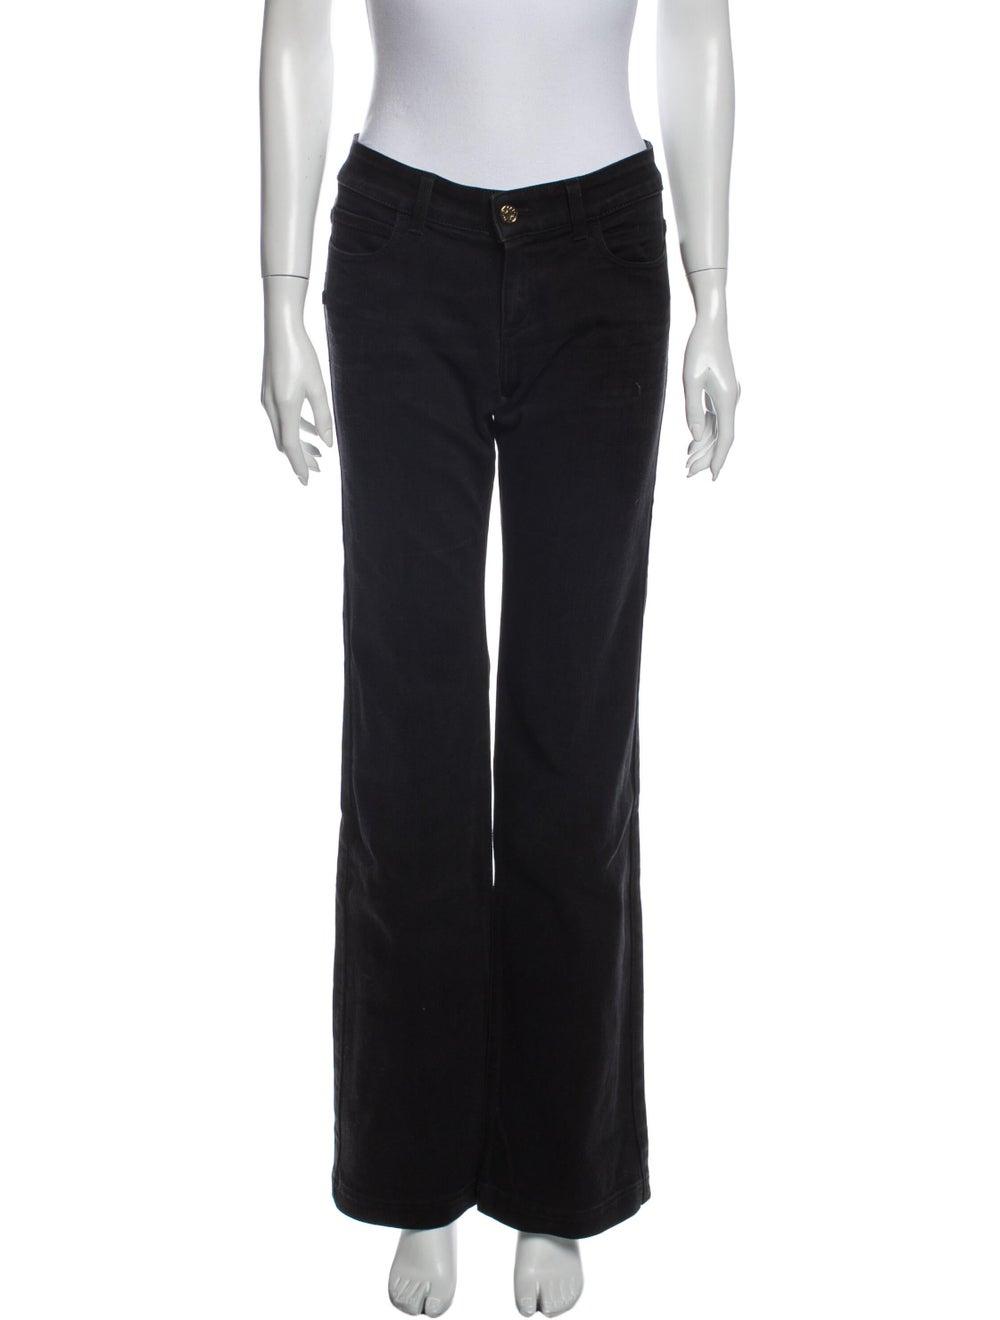 Gucci 70's Wide Leg Jeans Black - image 1